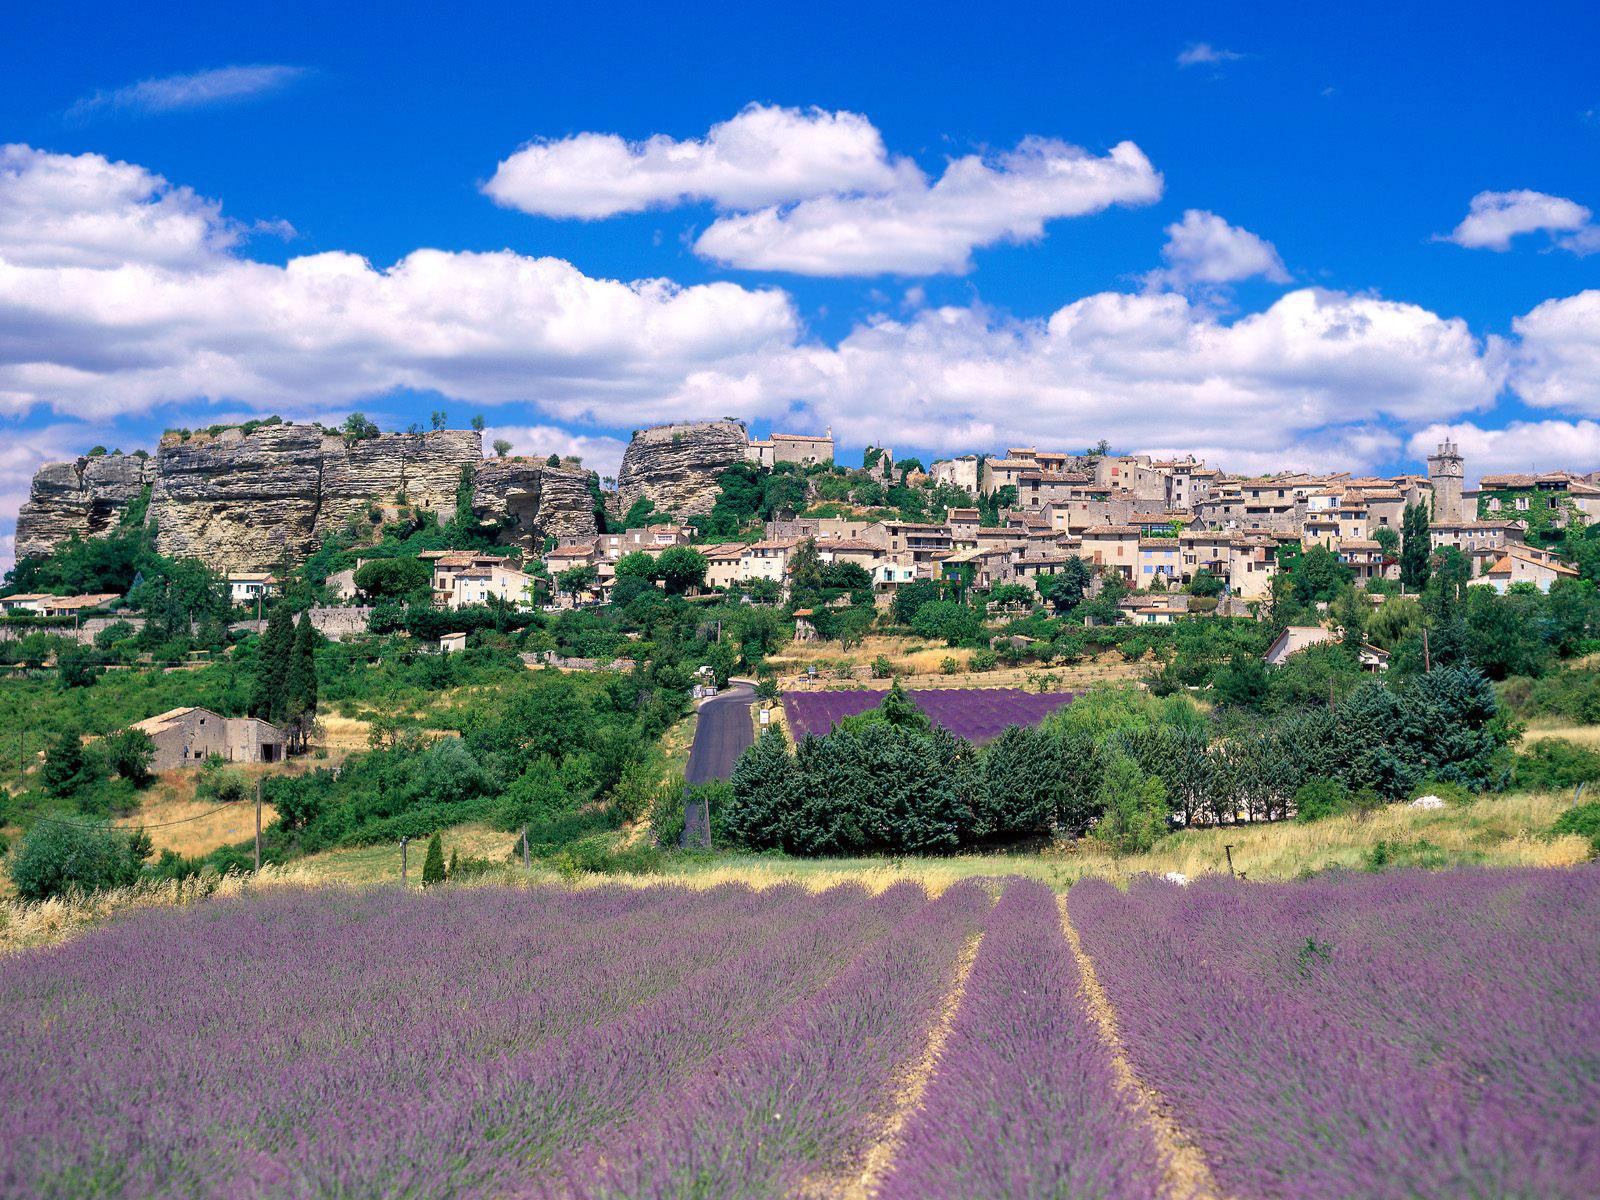 Hills of Saignon 9 France